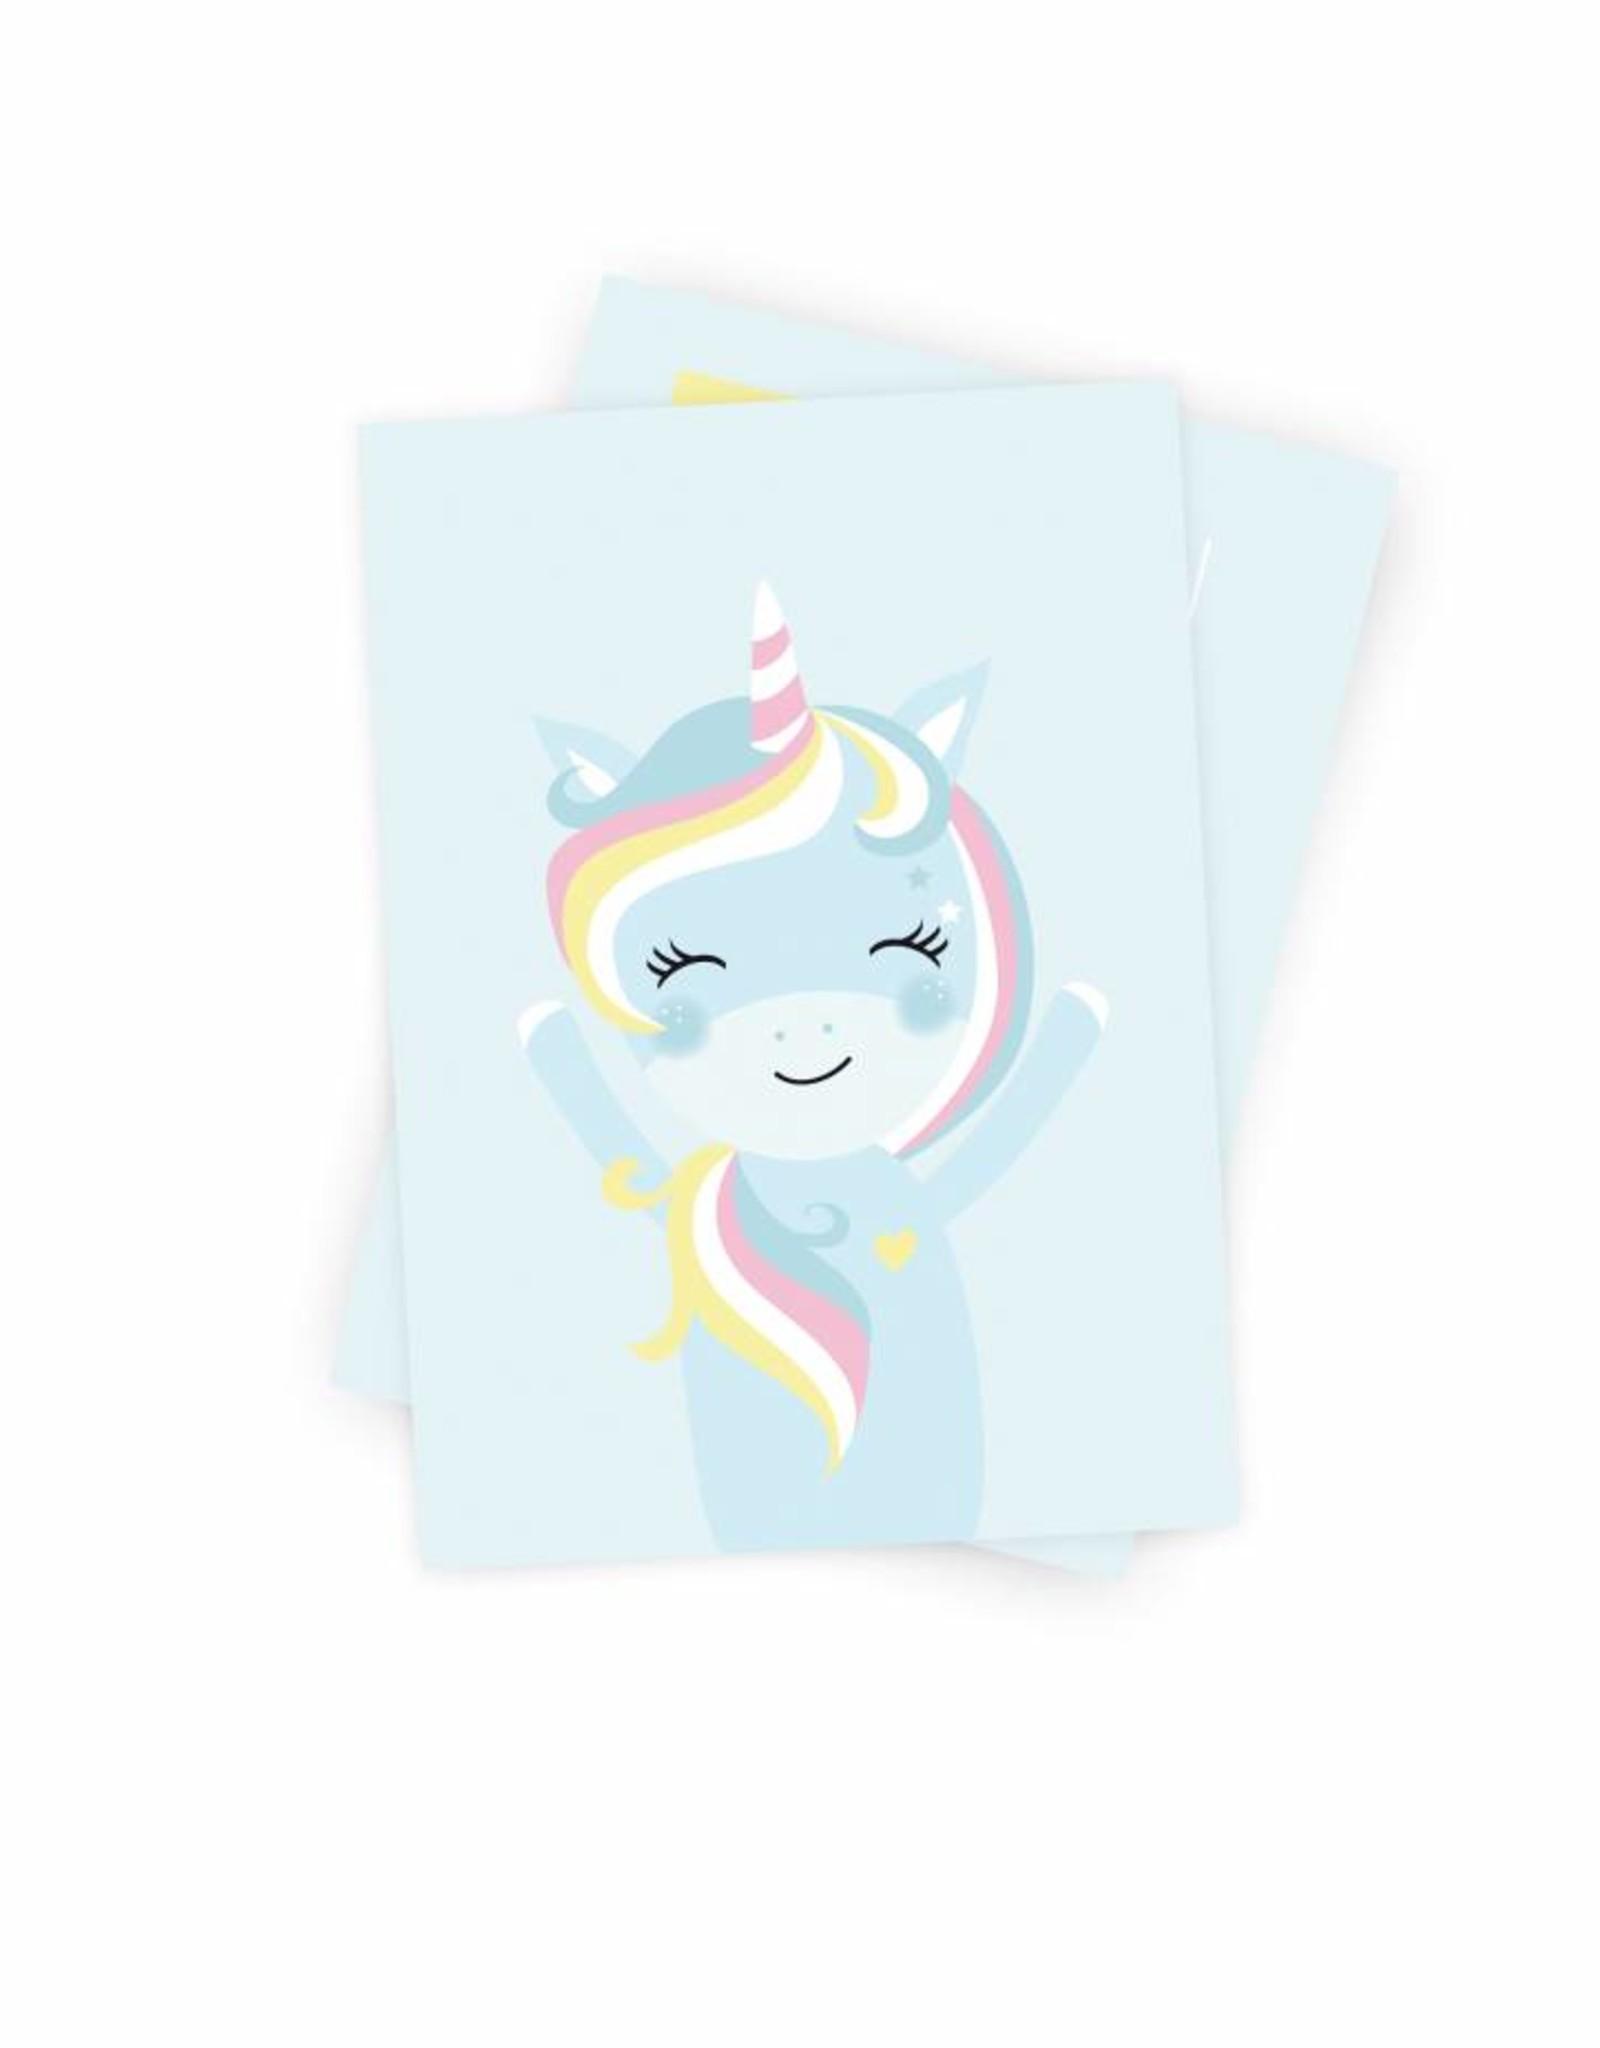 Poskarte Miss Unicorn - Original Mimirella Illustration